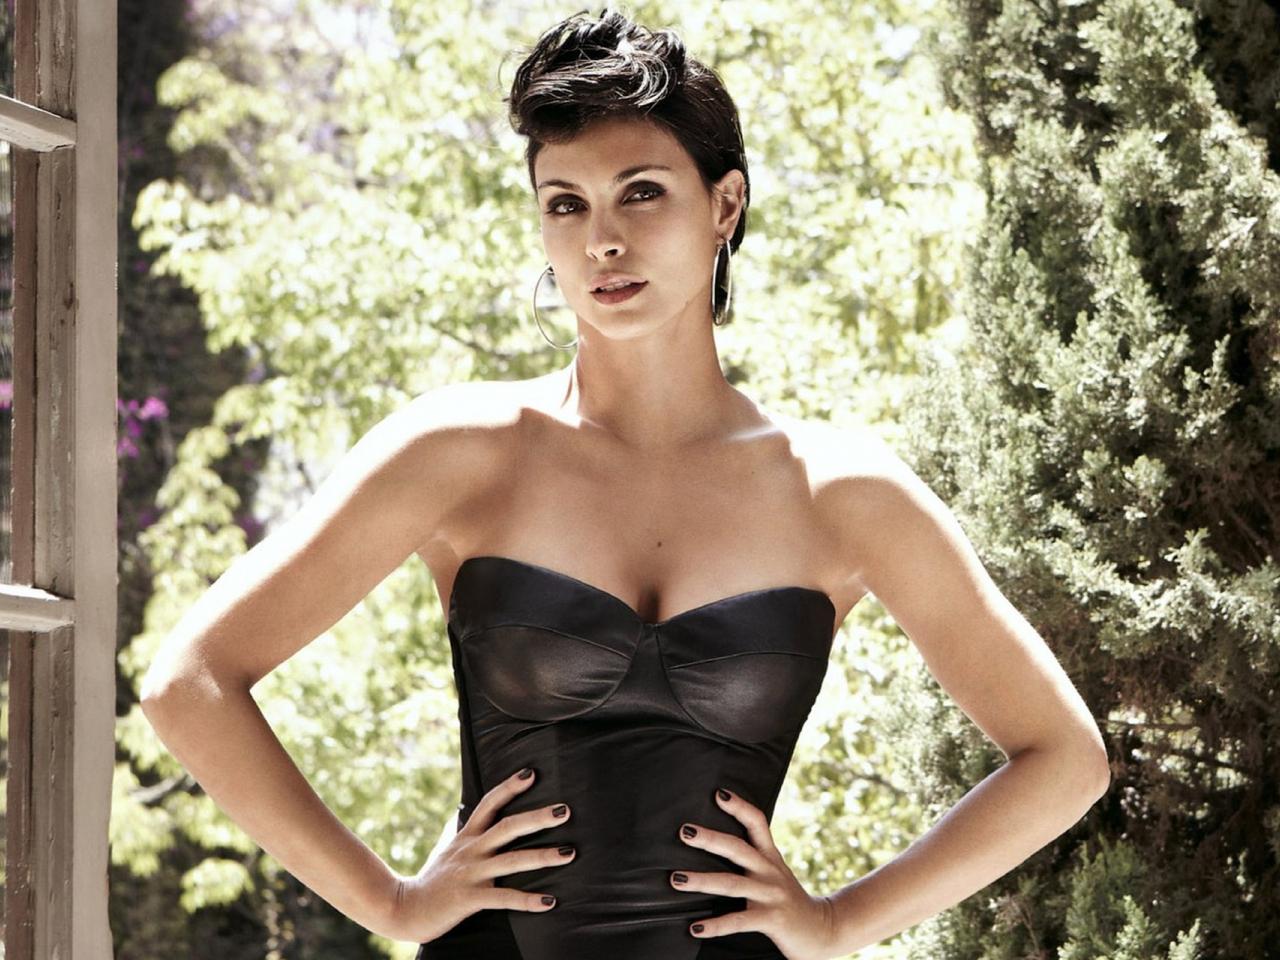 1280x960 wallpaper Hot Brazilian celebrity, actress, Morena Baccarin